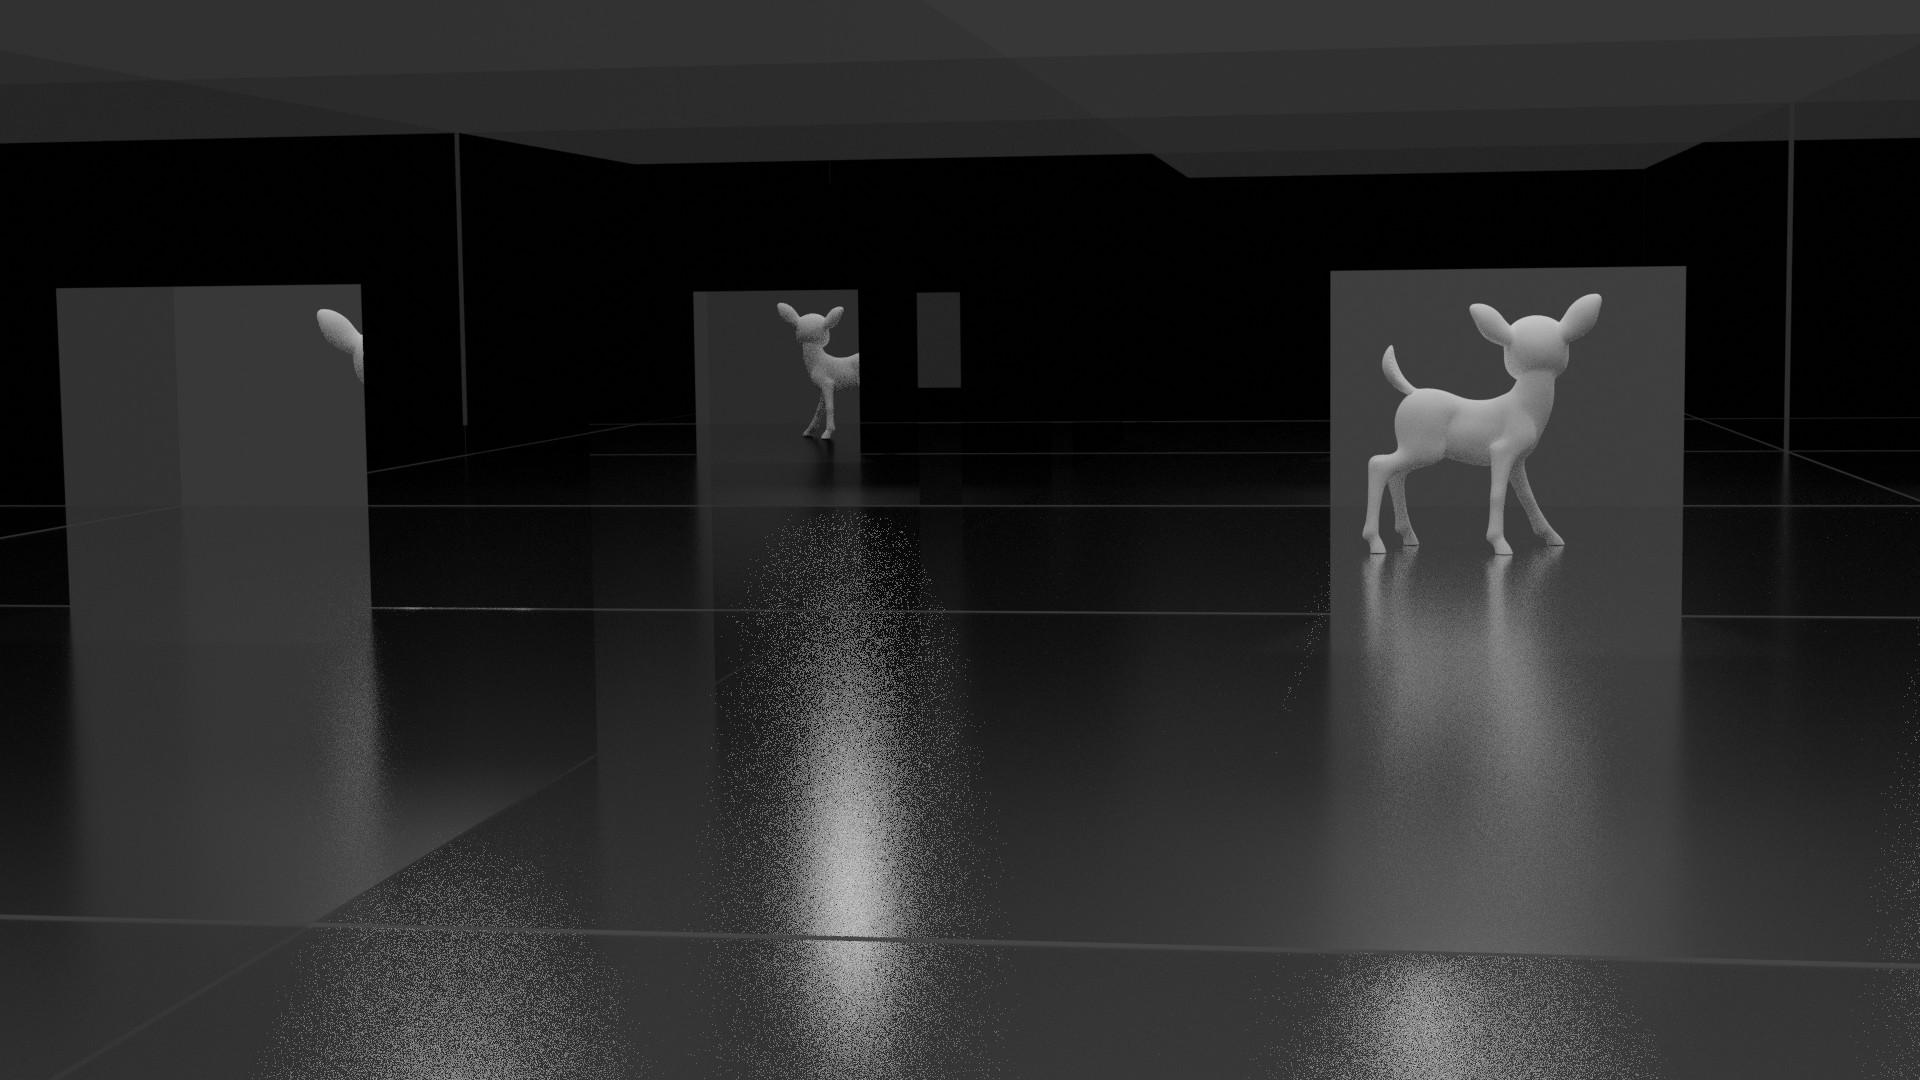 lisa-gimenez-objetos-insistentes-animacion